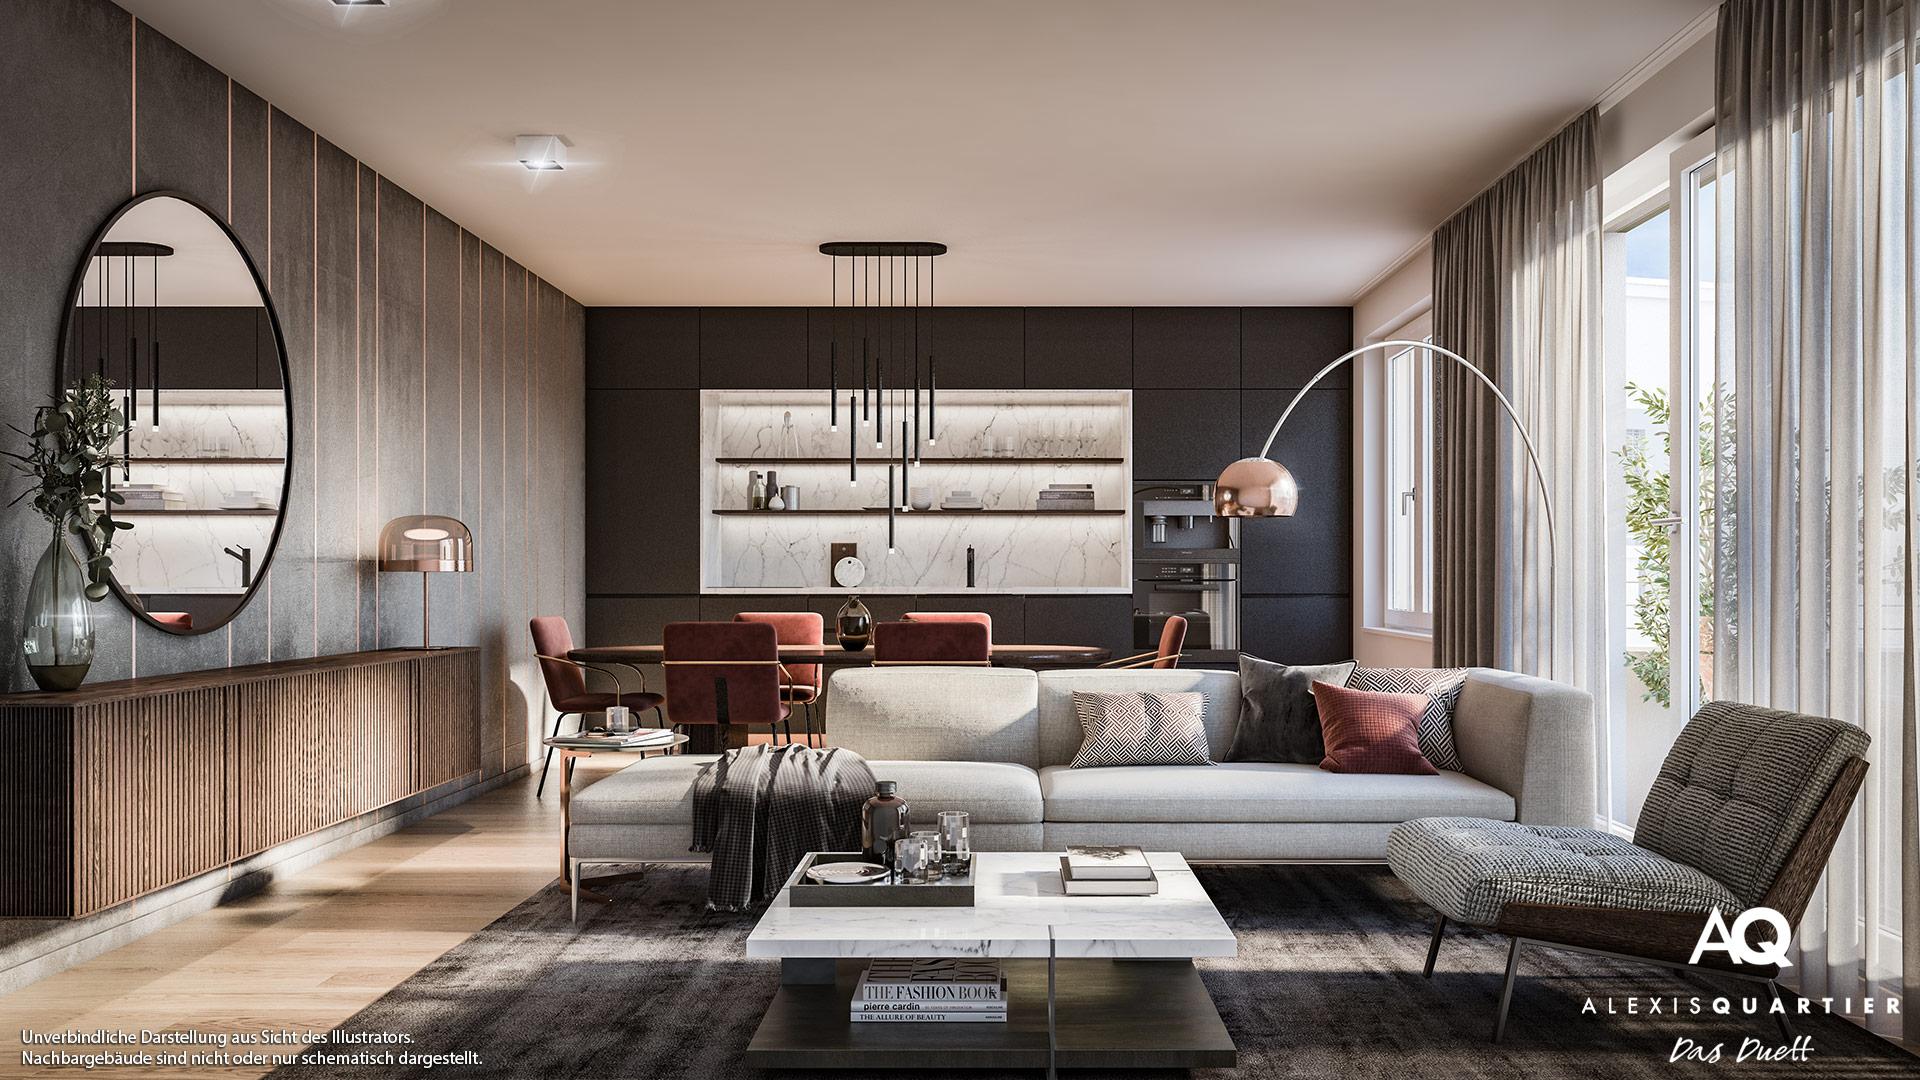 Immobilie Alexisquartier - Das Duett - Illustration 10